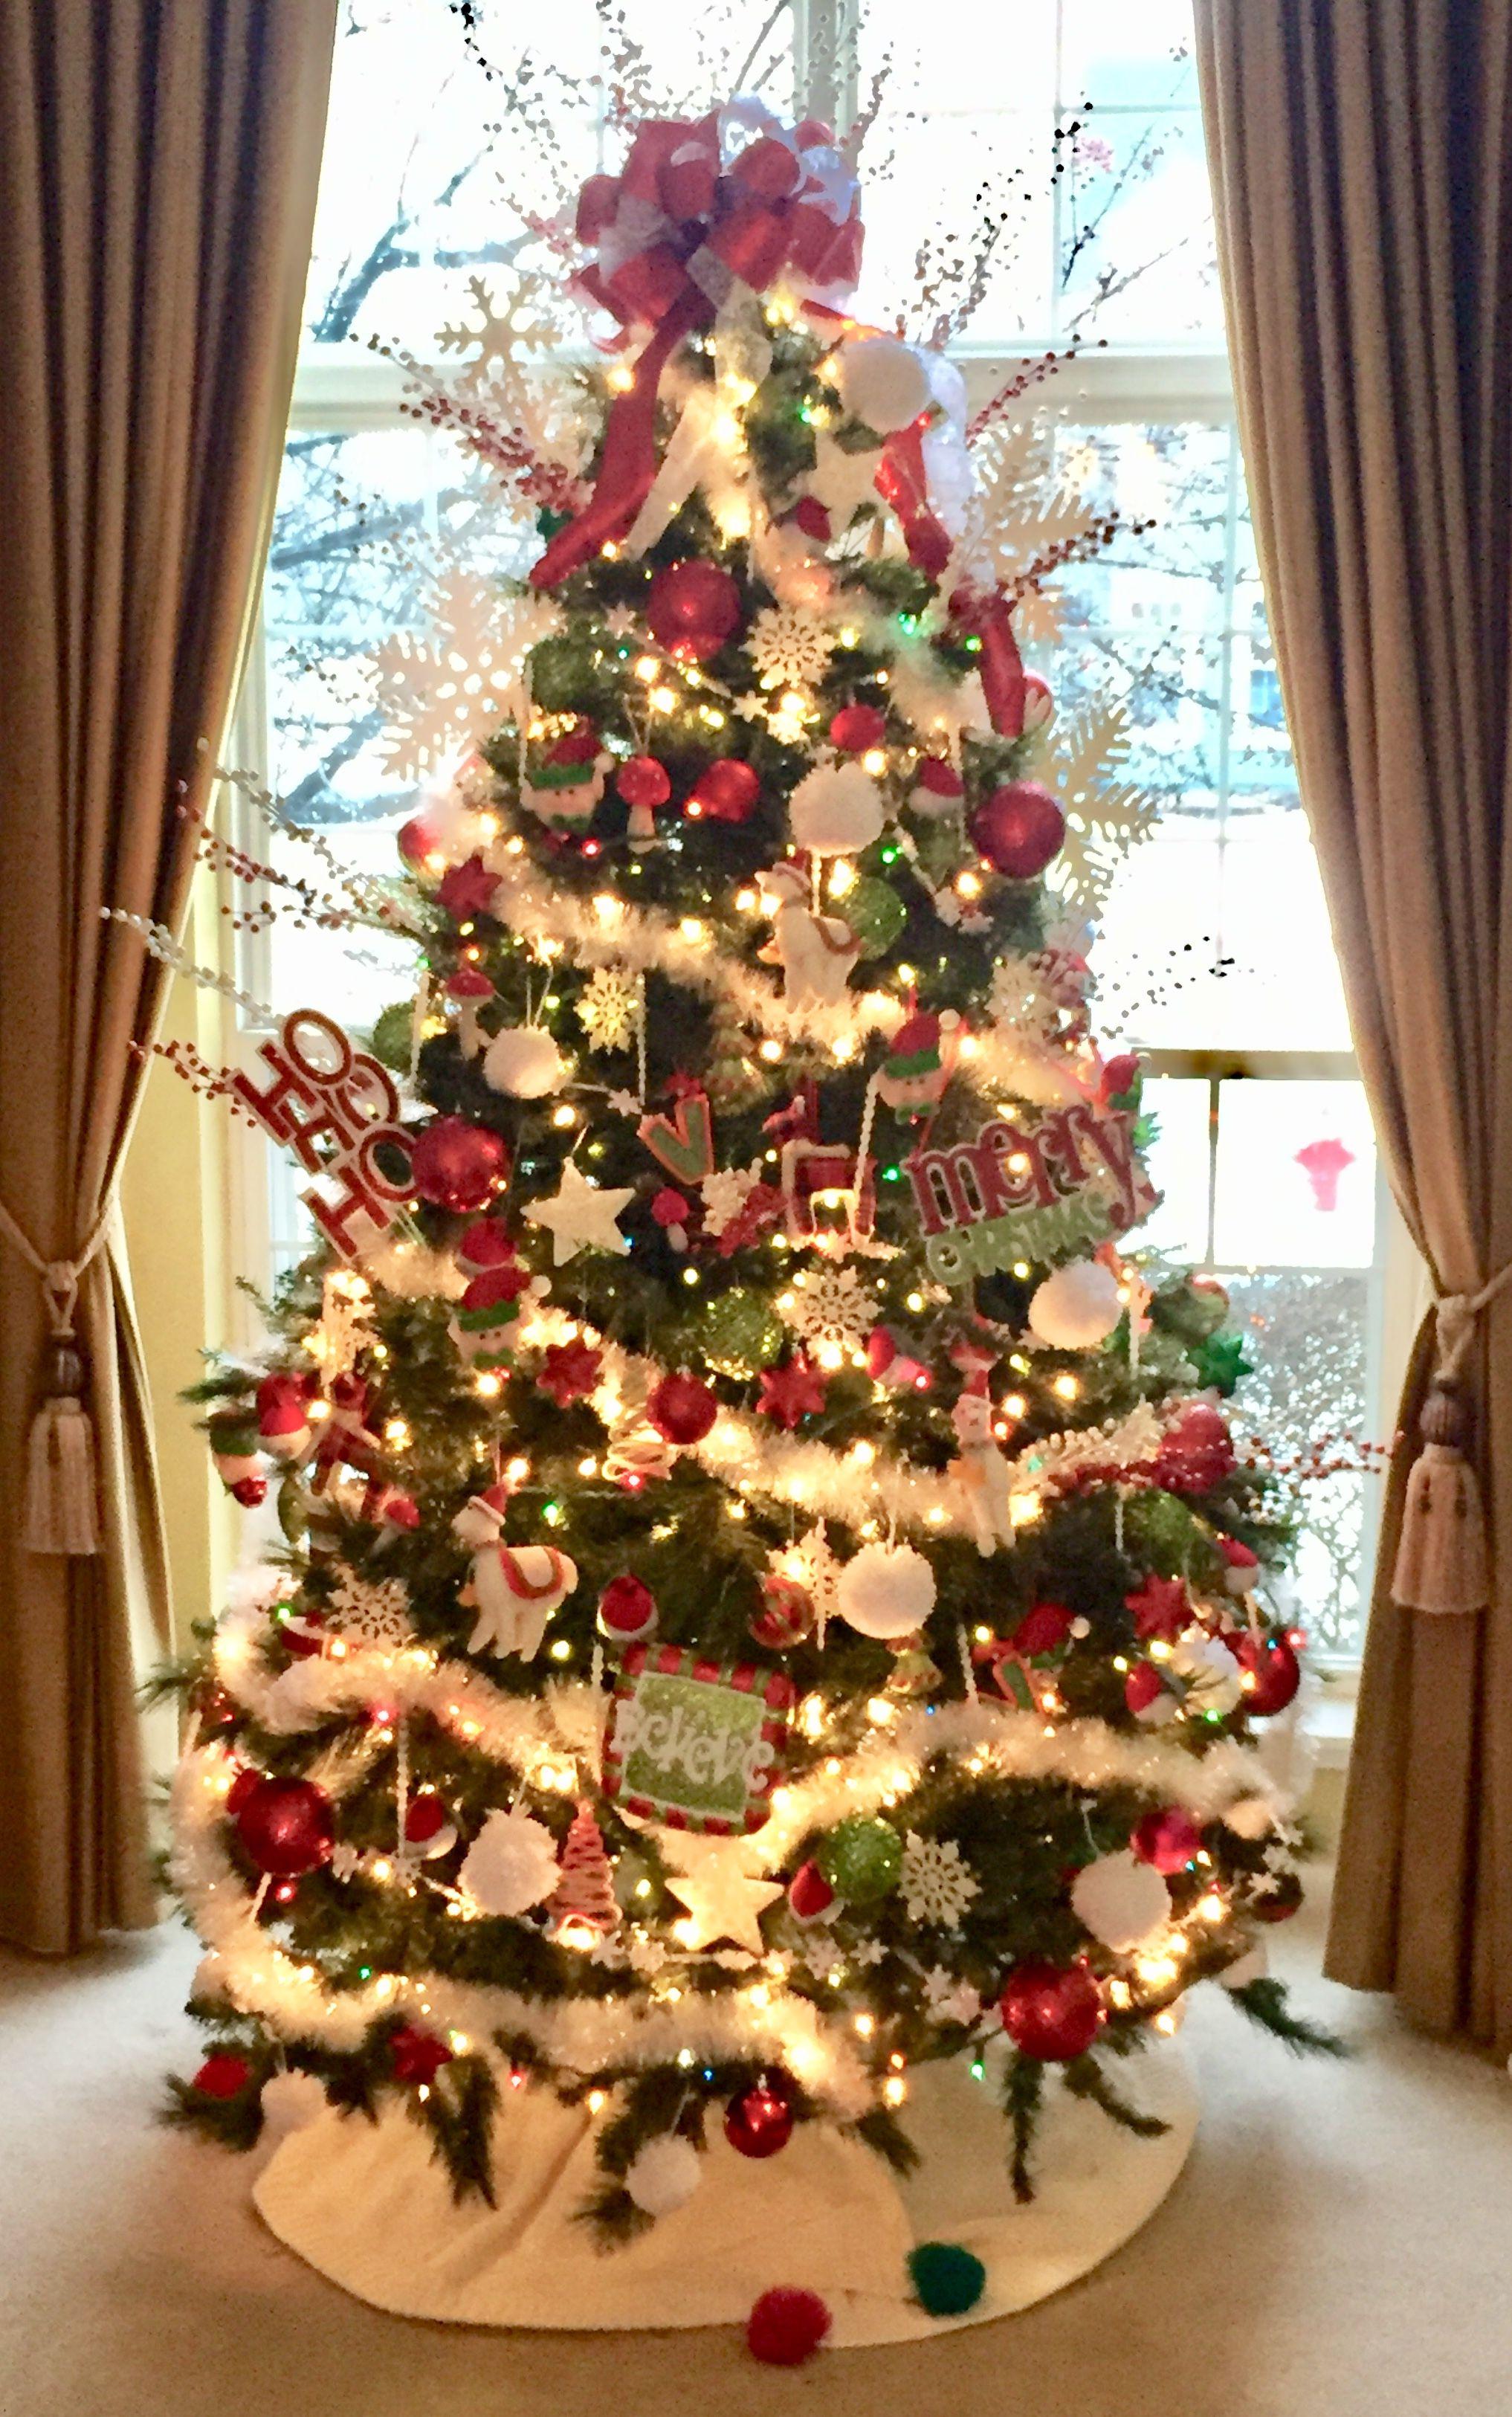 White And Red Christmas Tree Snowflakes Snow Balls Icicles Red Christmas Tree Christmas Tree Inspiration Christmas Tree